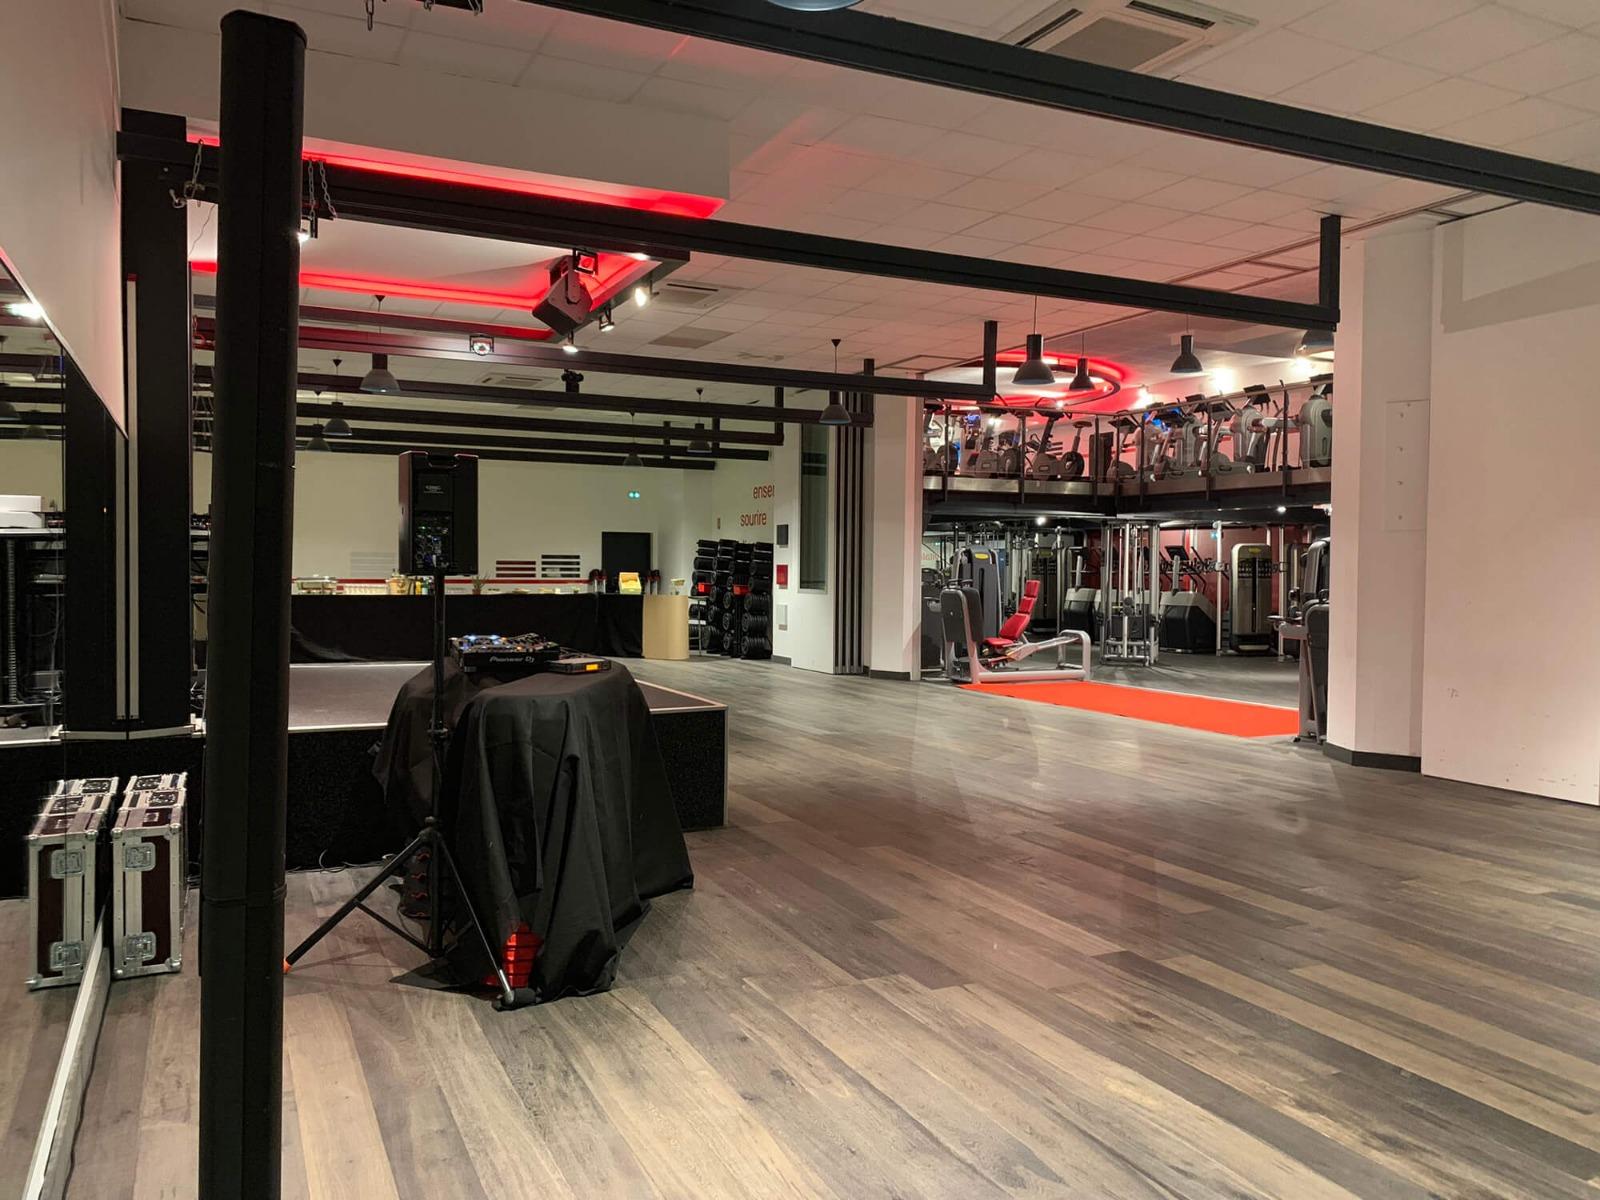 Installation son, lumière salle de fitness